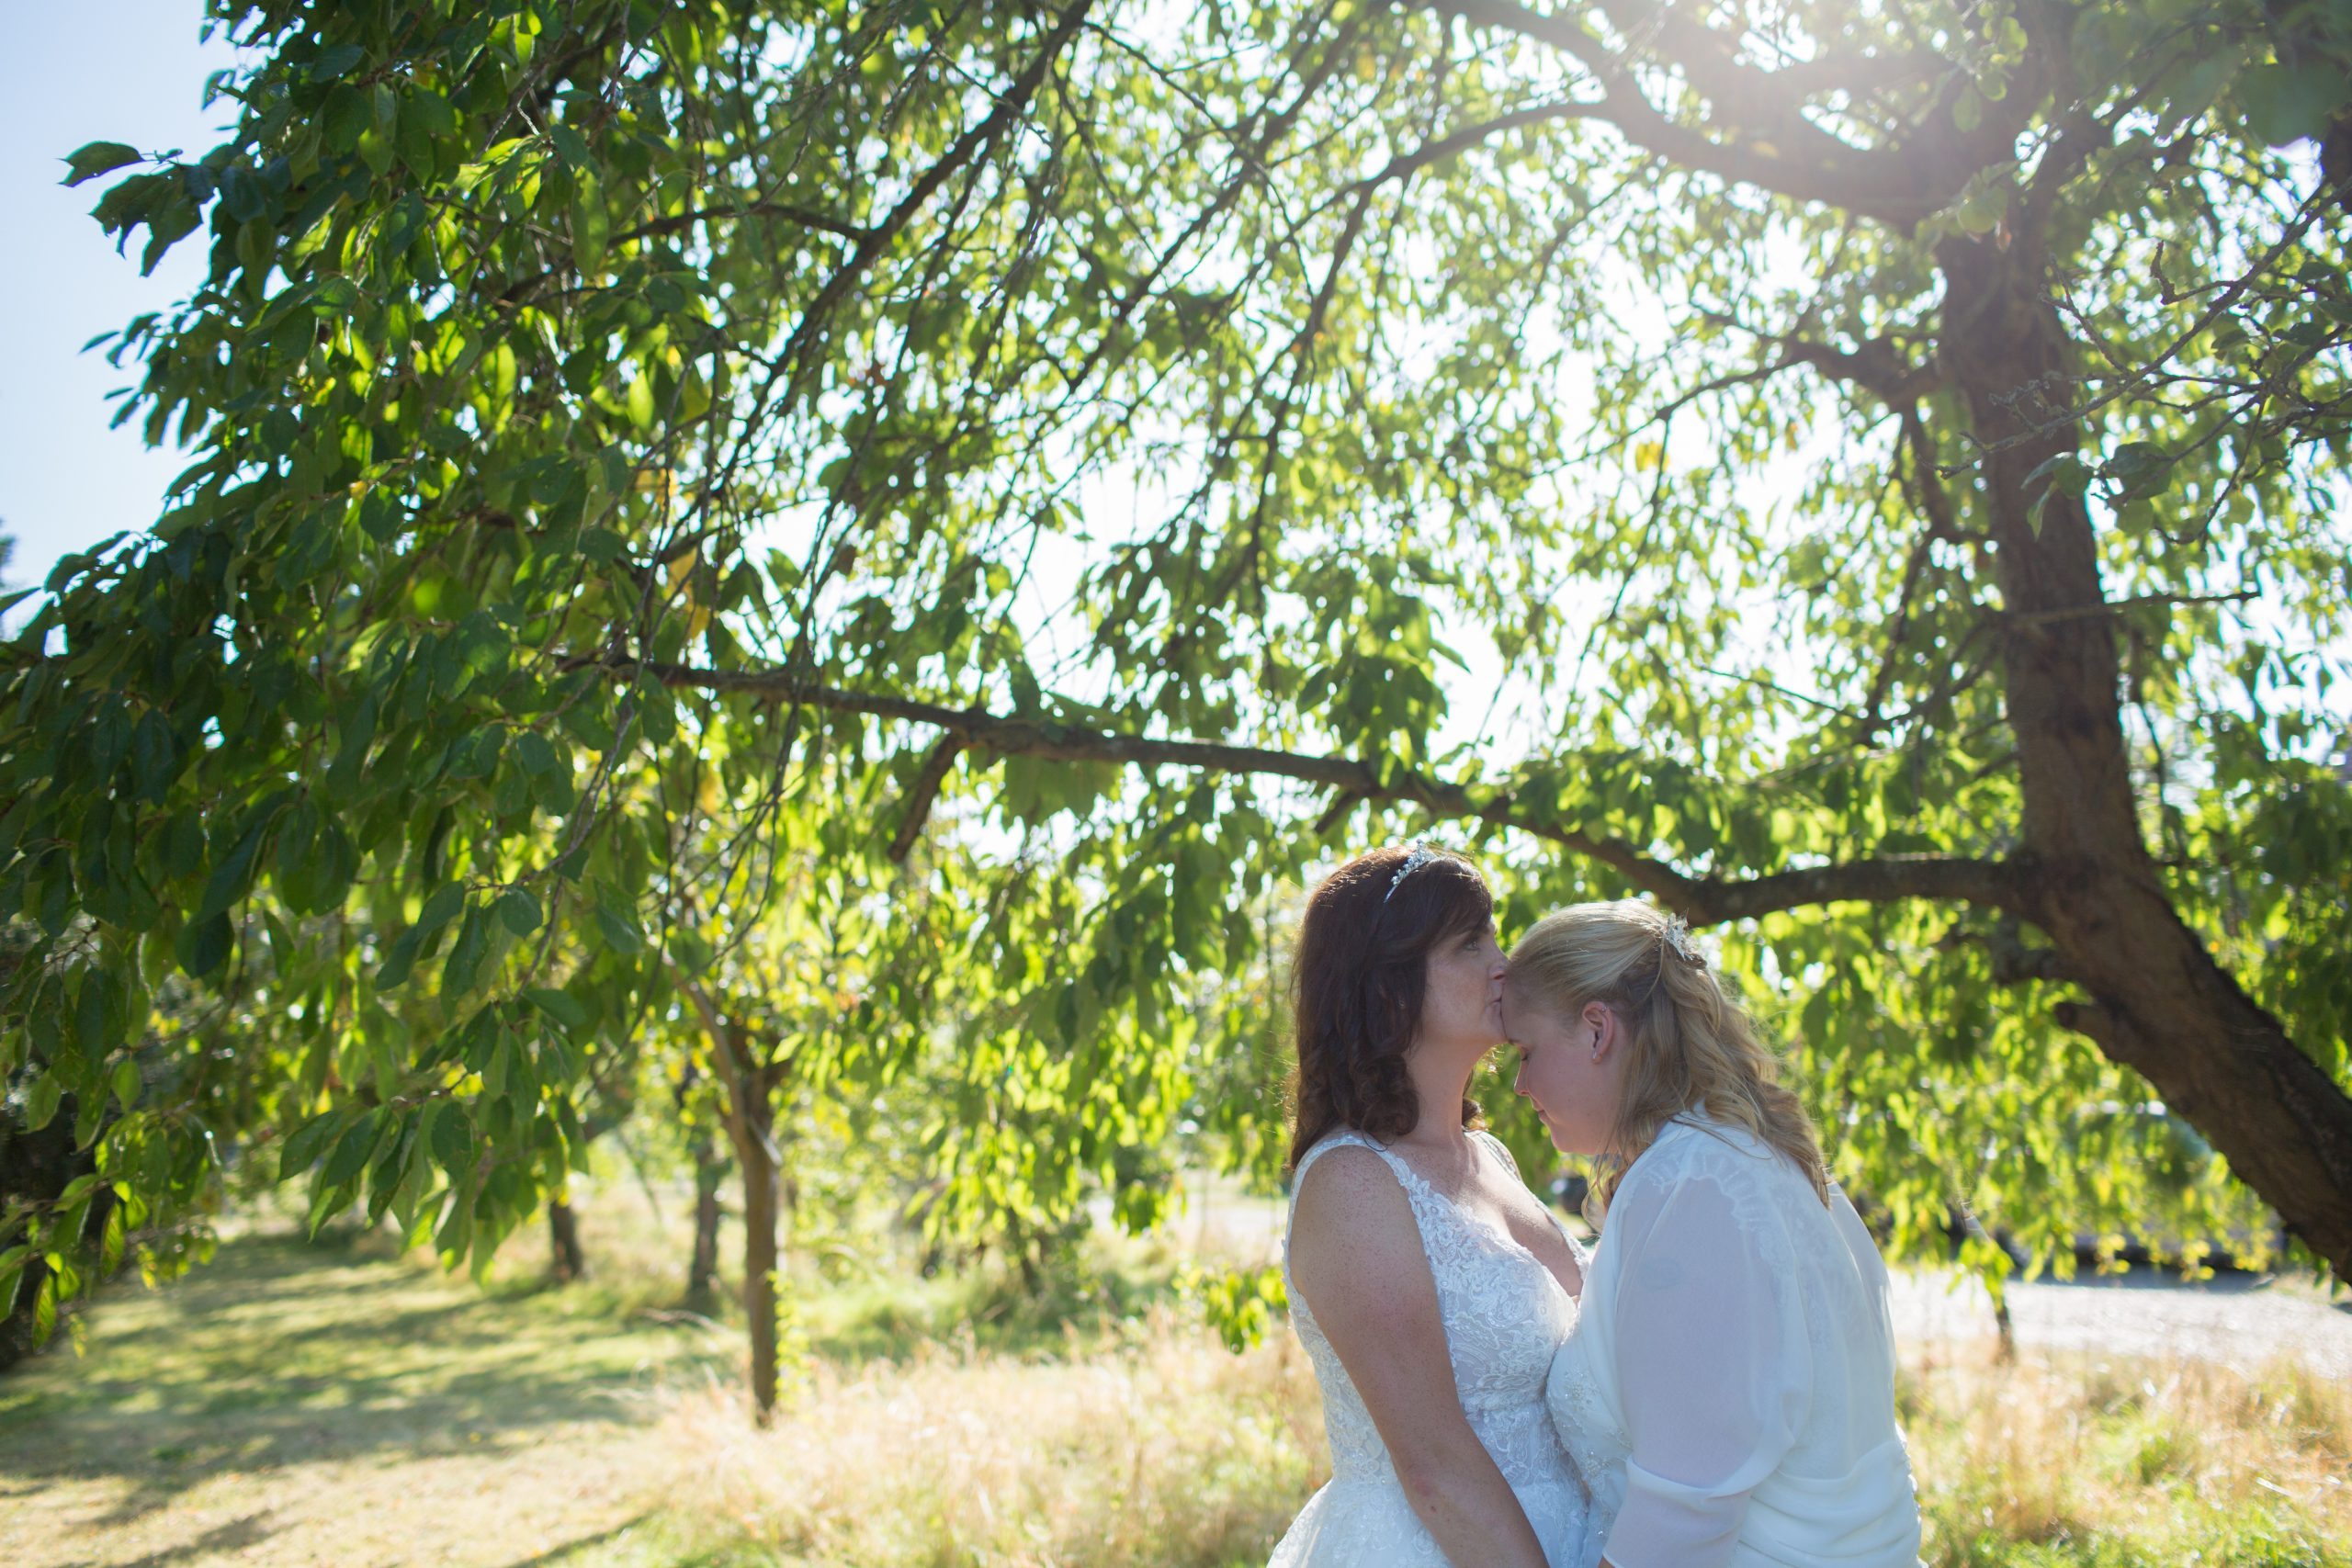 bride and bride stood under tree on wedding day